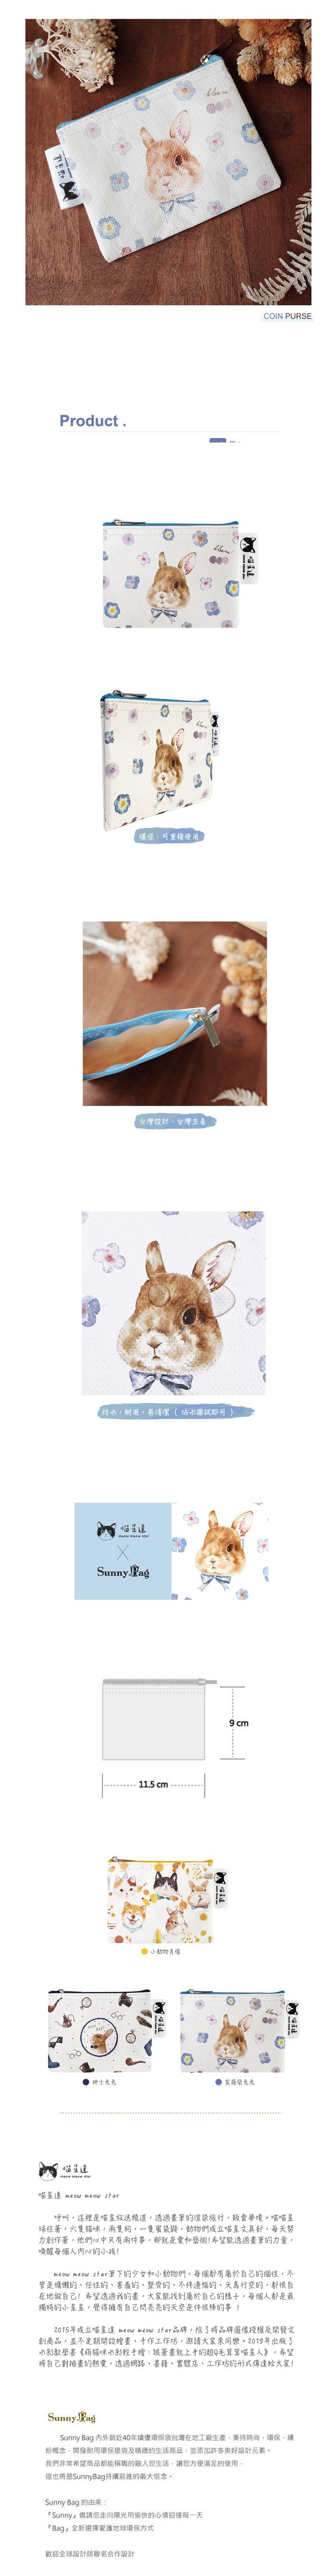 (複製)Sunny Bag 喵星達-兔兔暈染化妝包